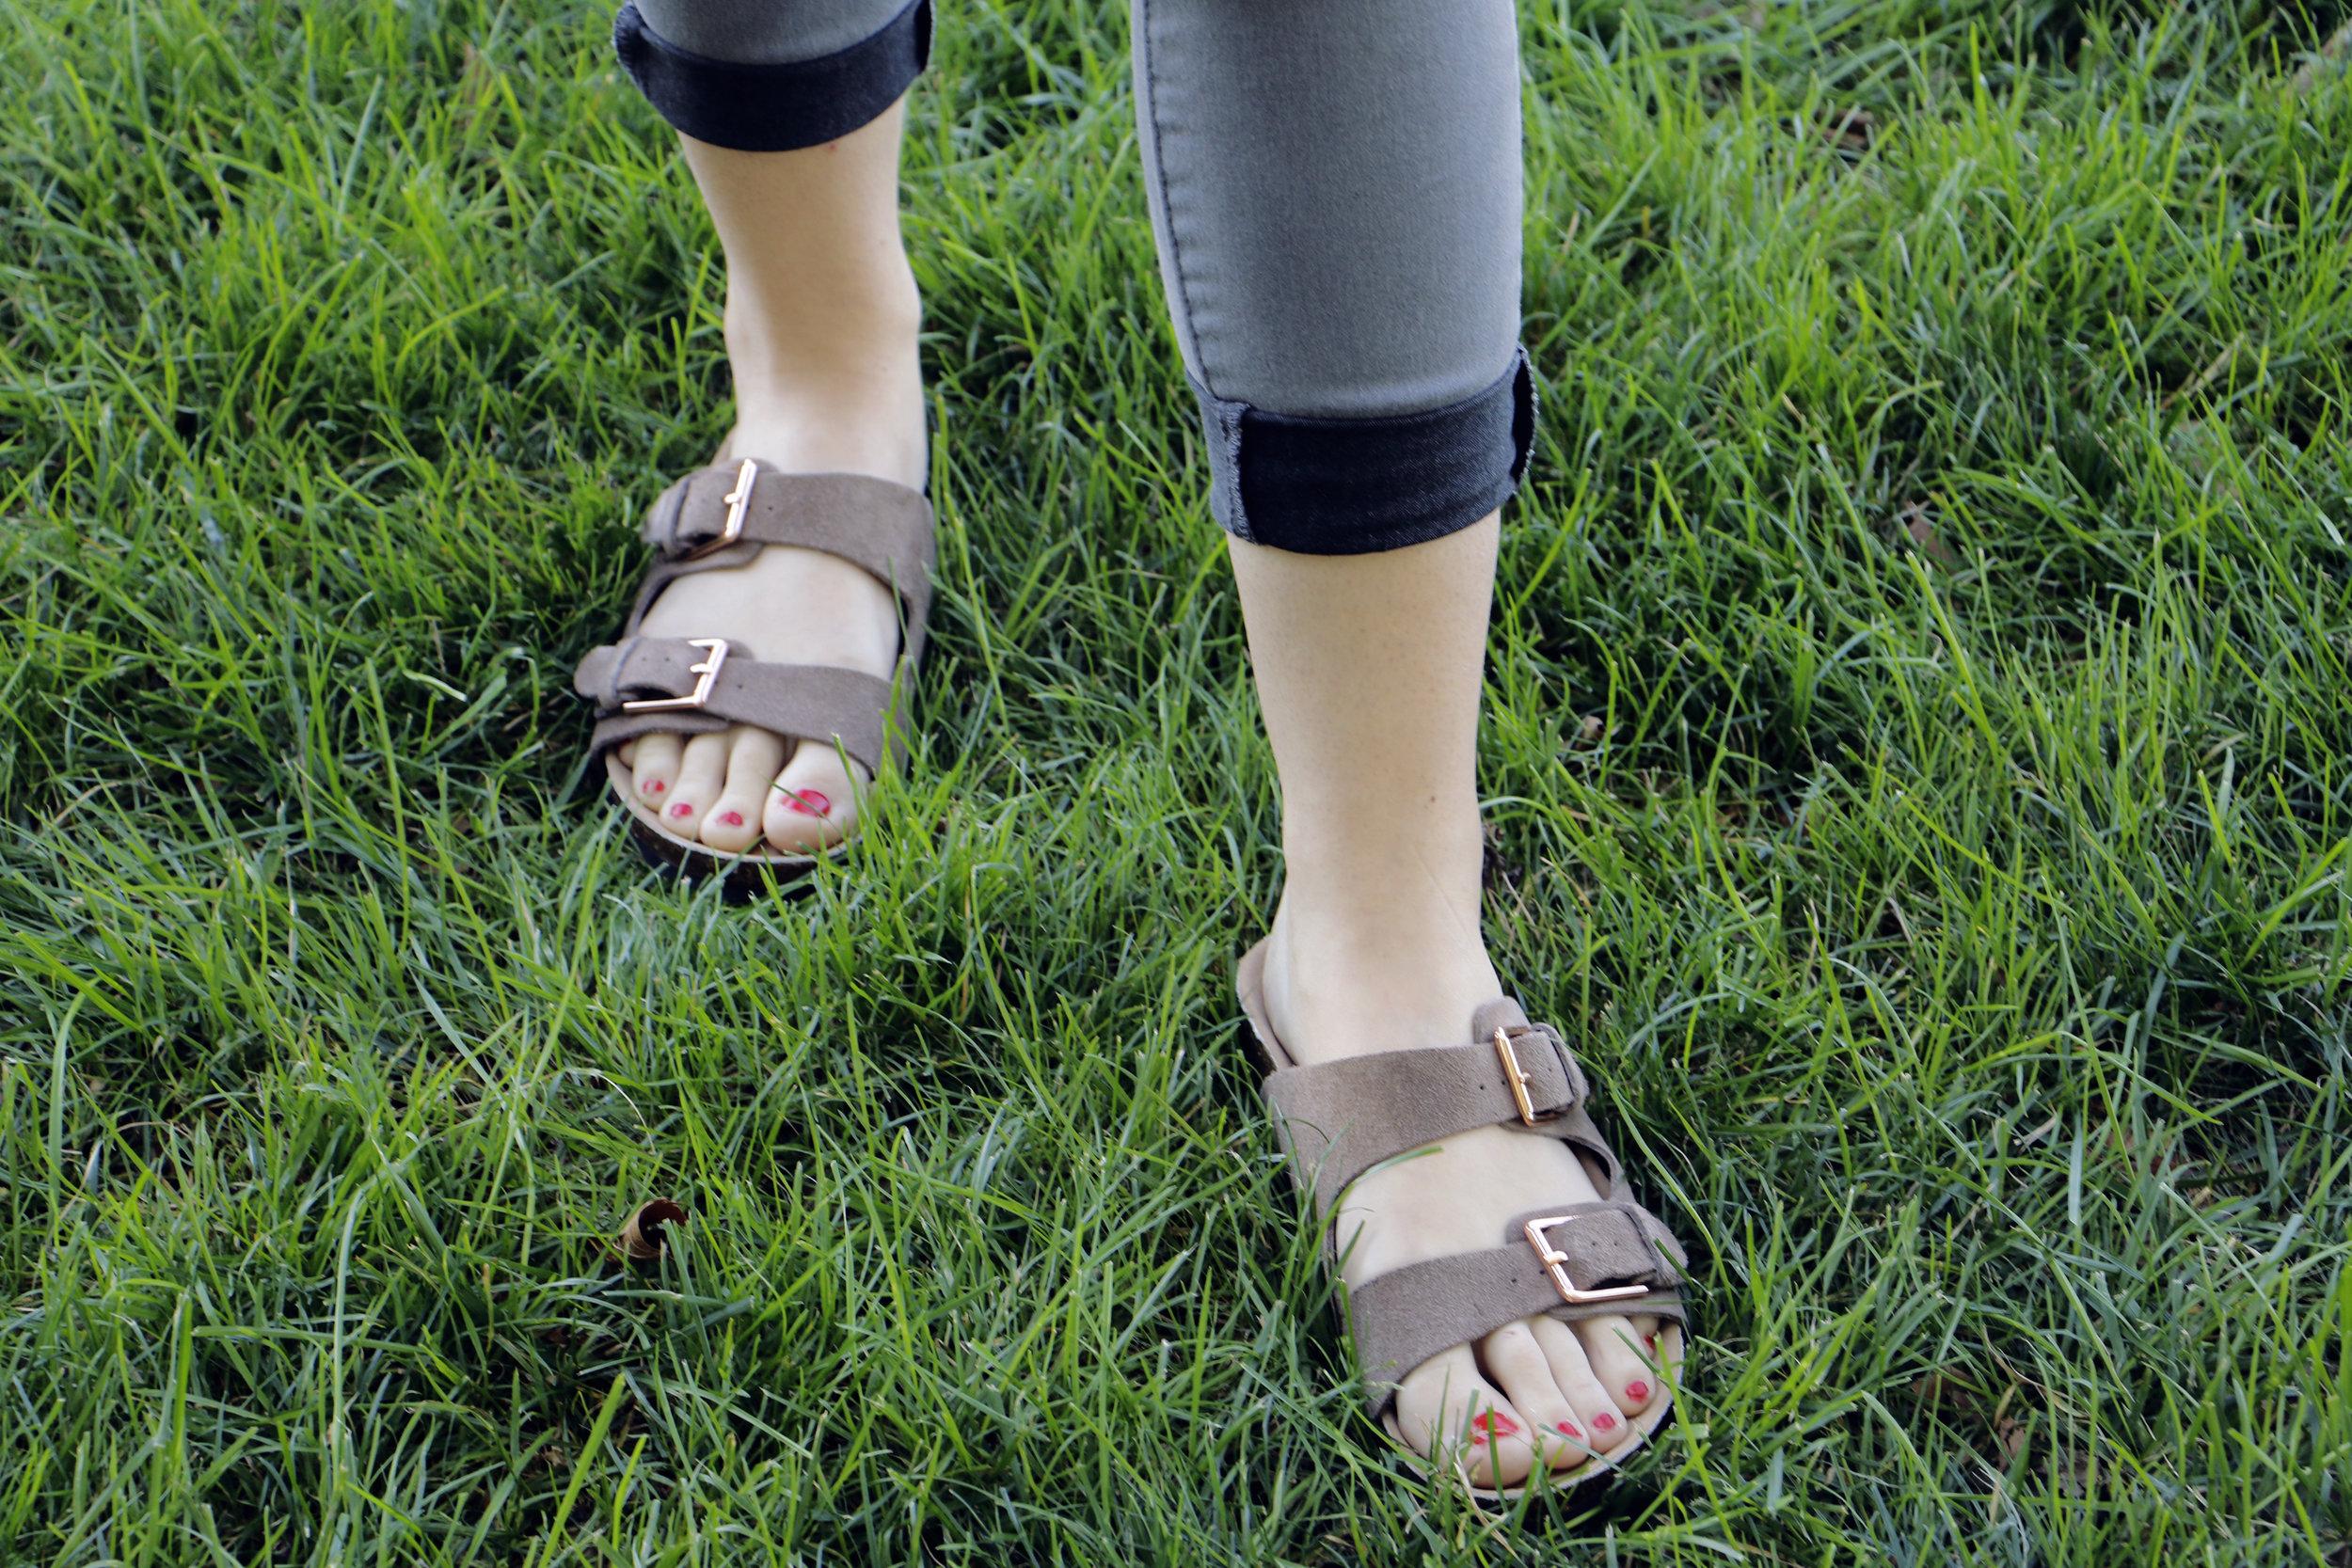 maliqi.golden.shoes.9.jpg